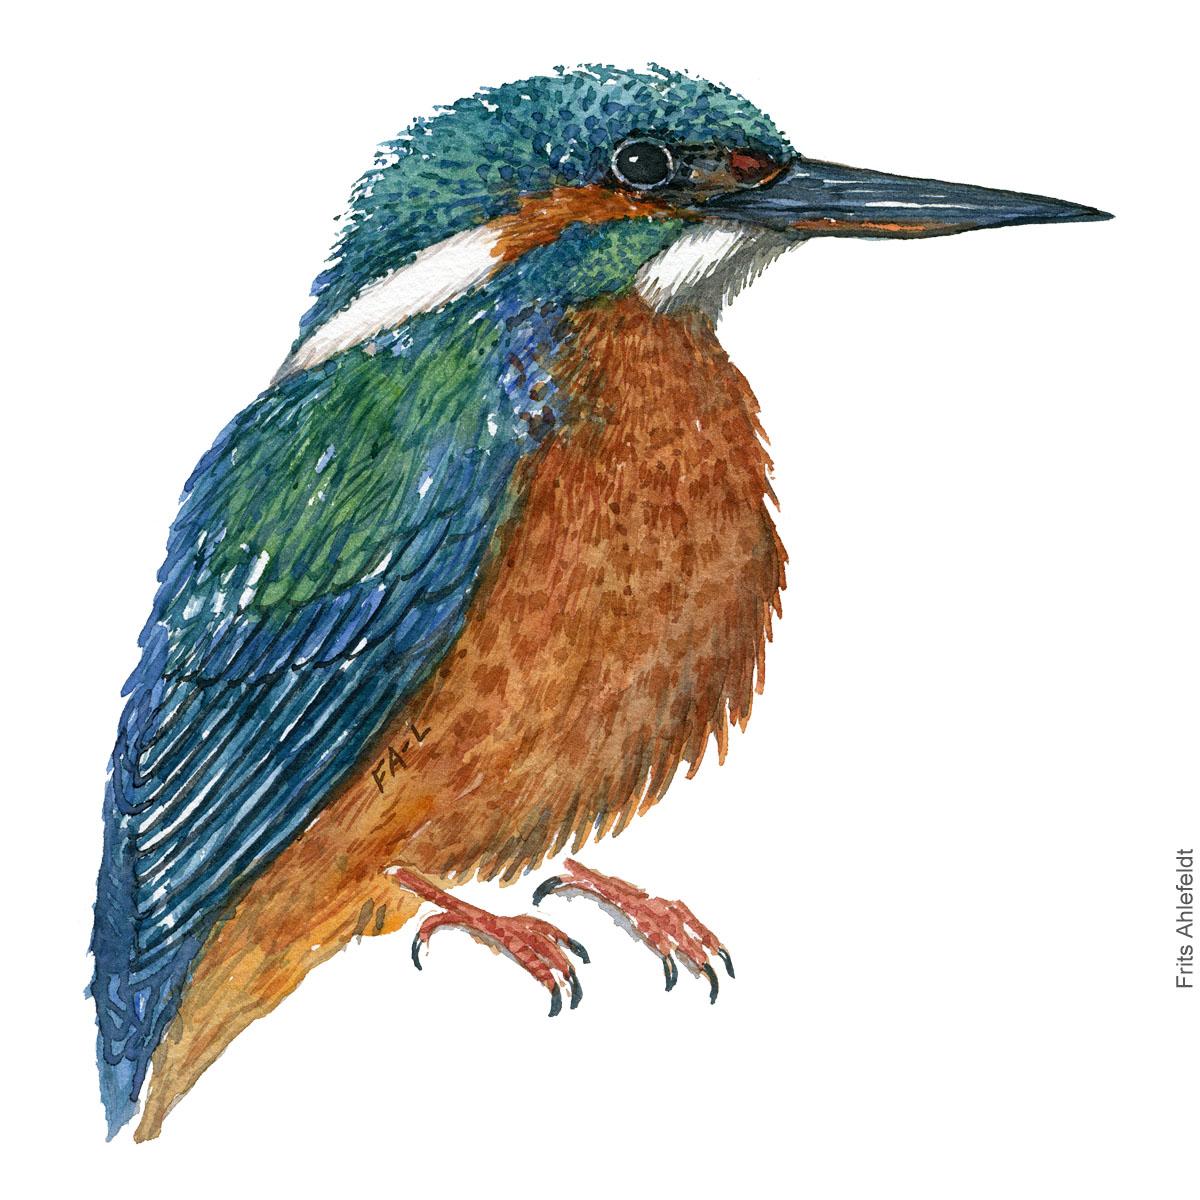 Isfugl - Kingfisher - Bird watercolor painting. Artwork by Frits Ahlefeldt. Fugle akvarel